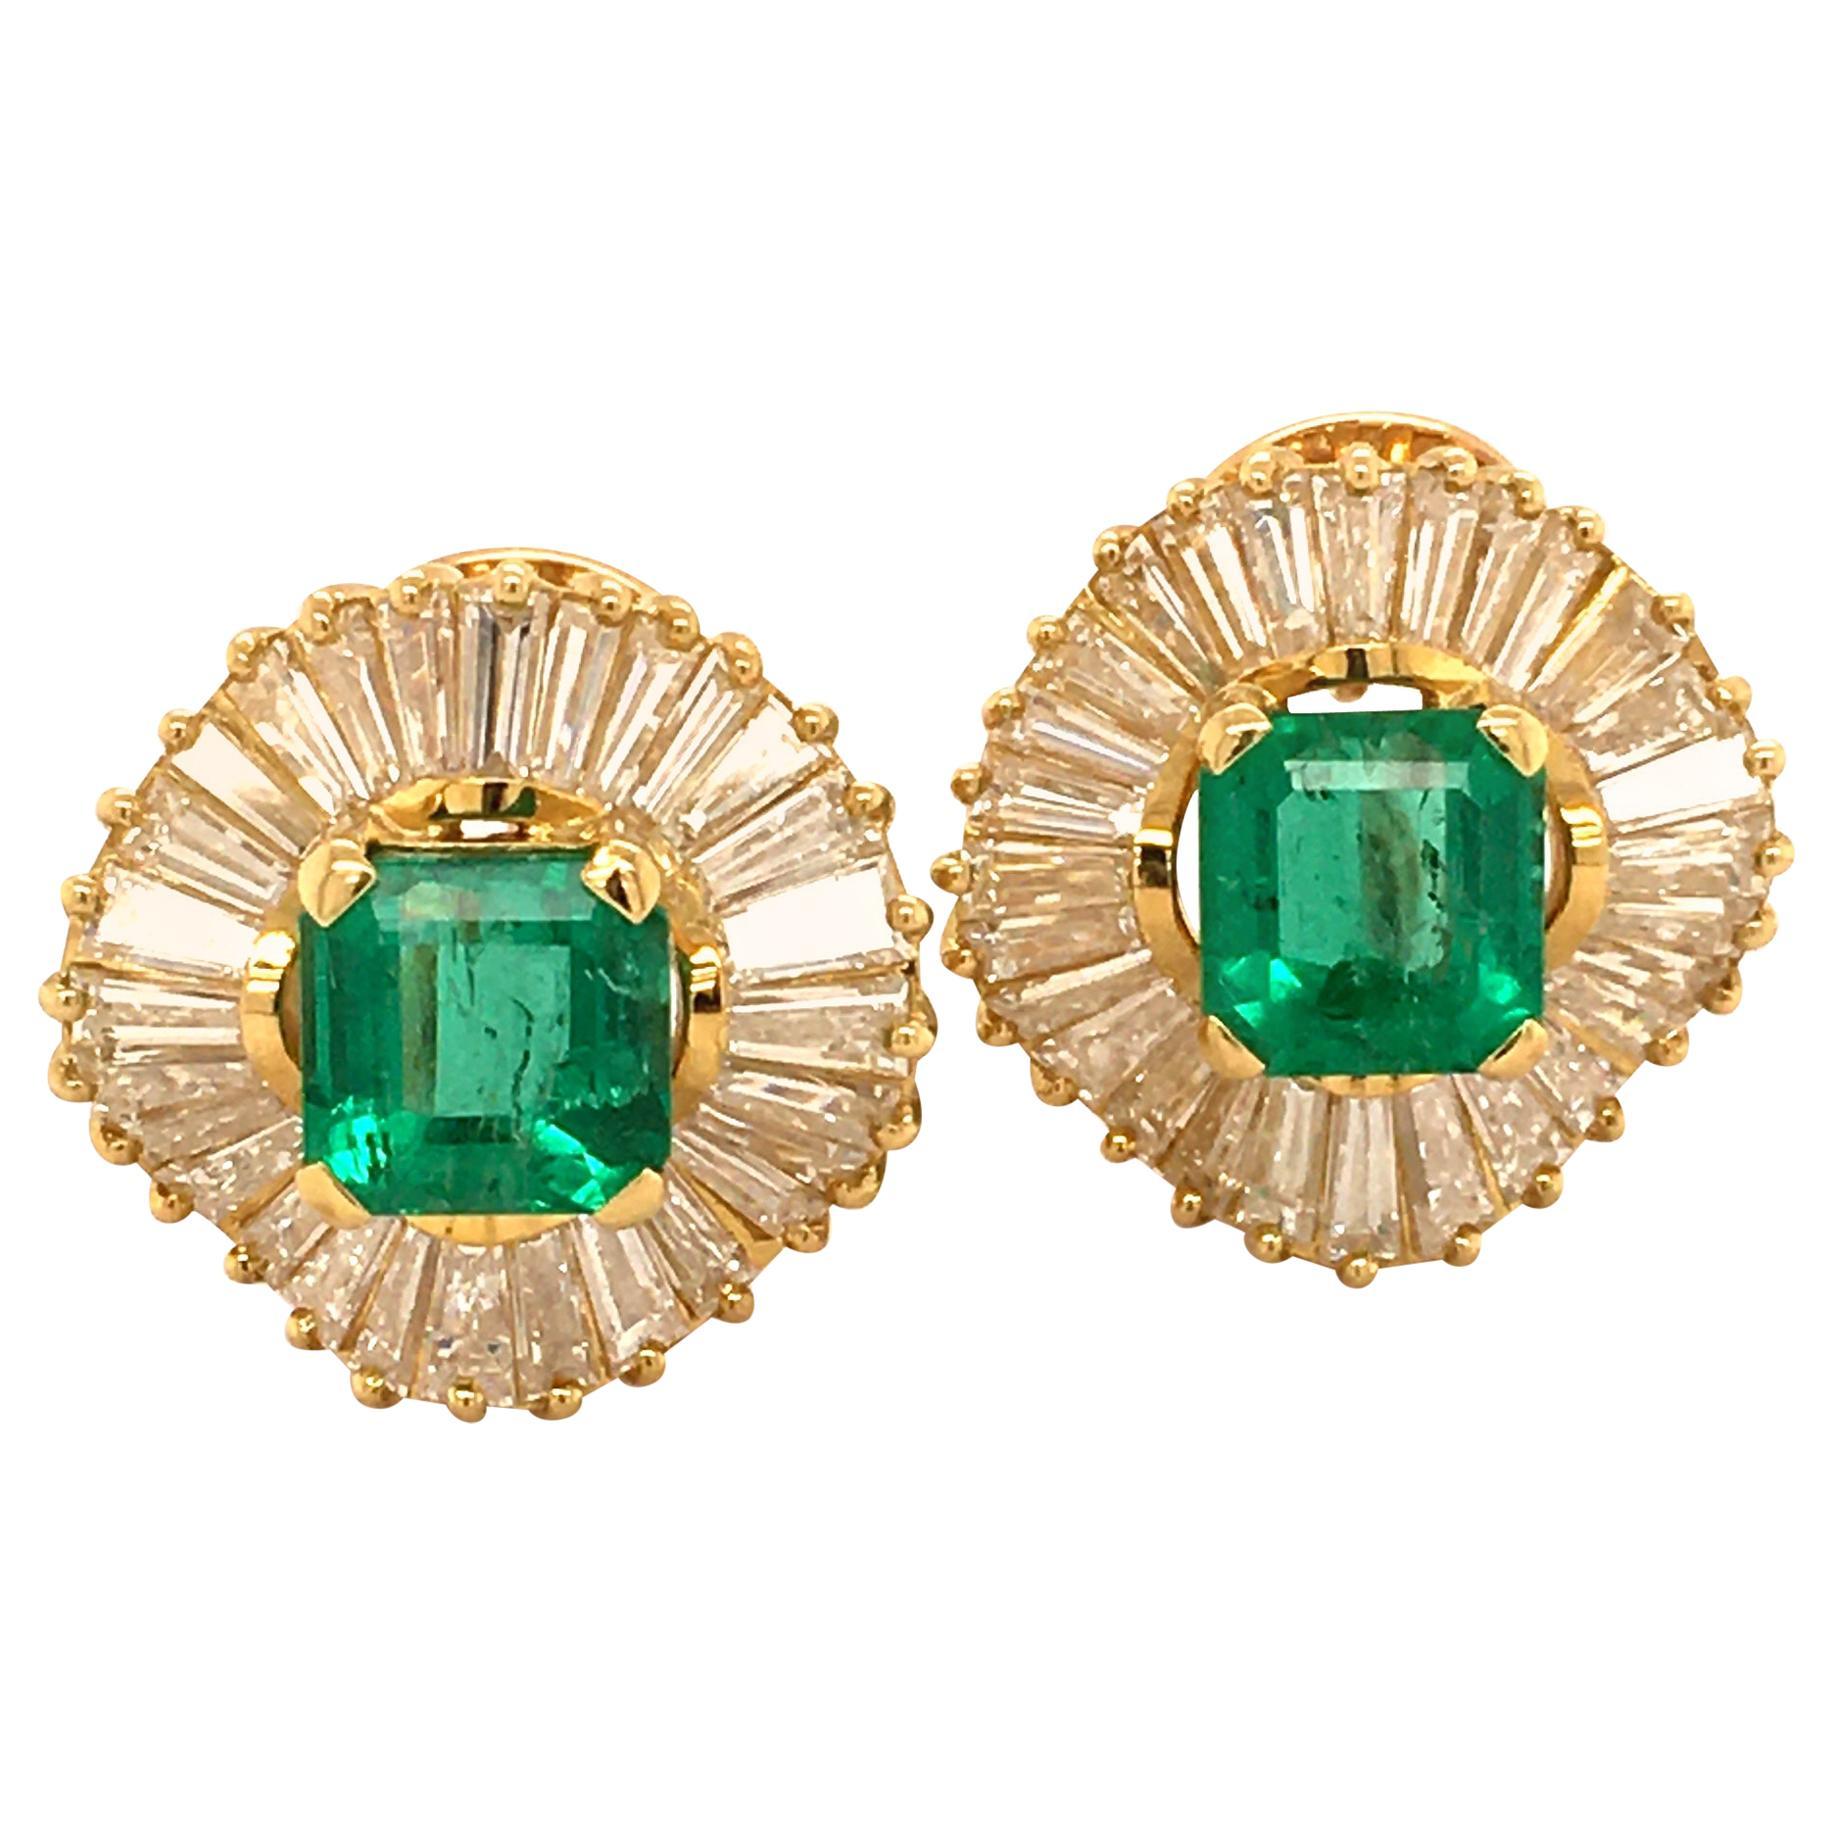 Emerald and Diamond Ballerina Earclips in 18 Karat Yellow Gold